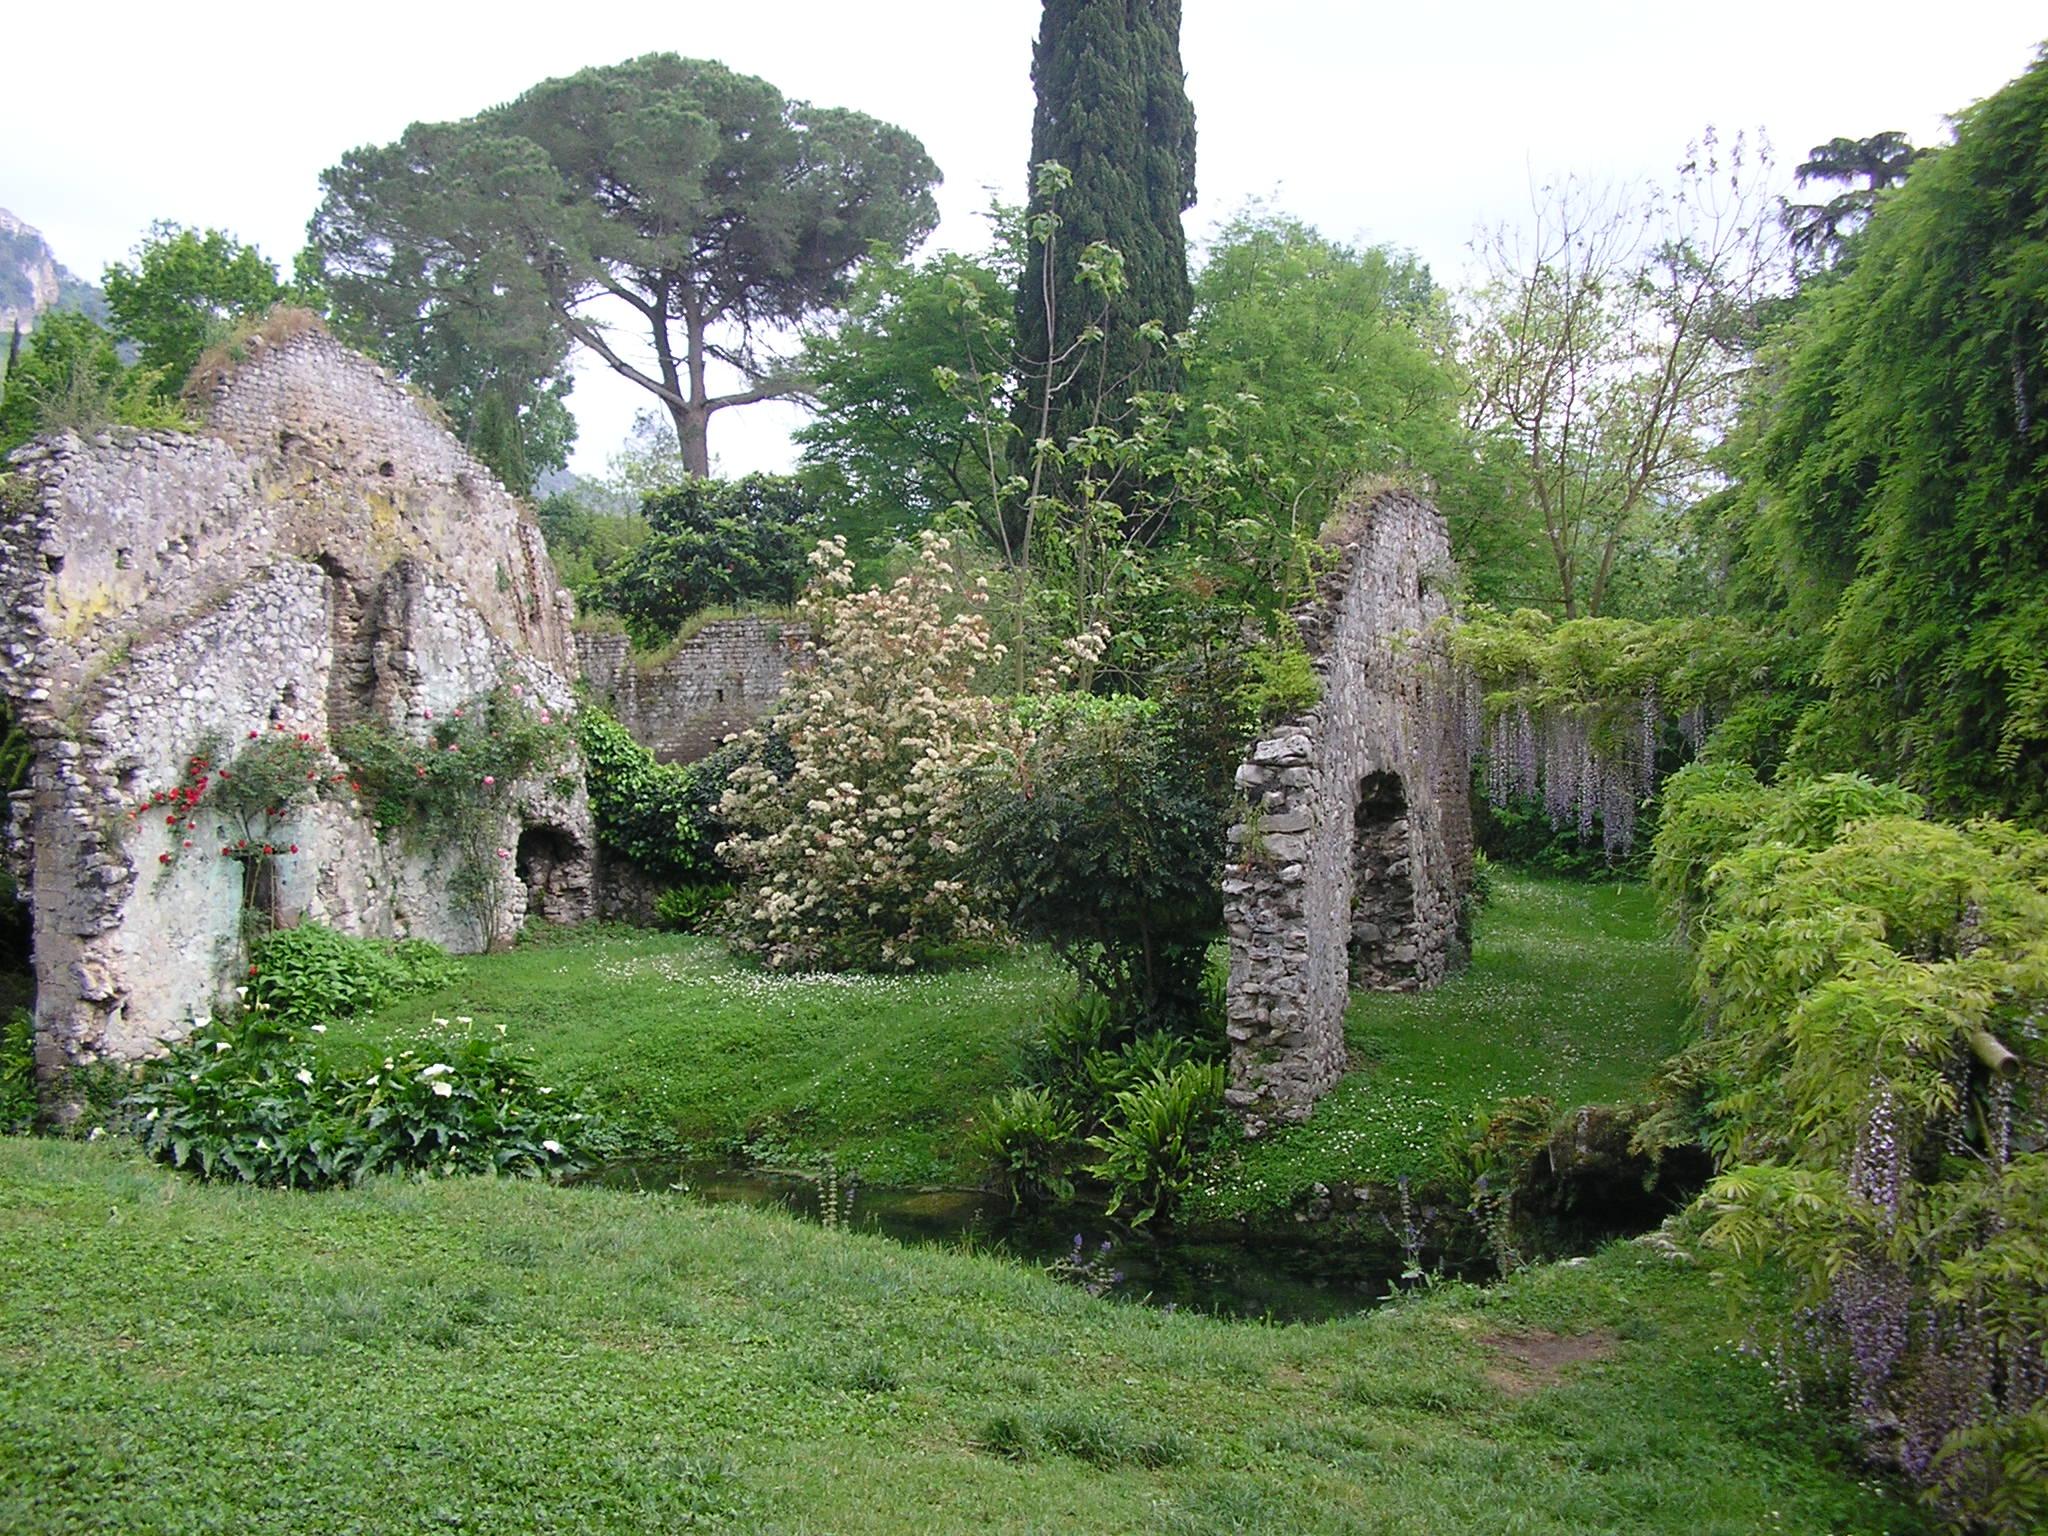 Giardino di ninfa luoghi italianbotanicaltrips - Giardini particolari ...